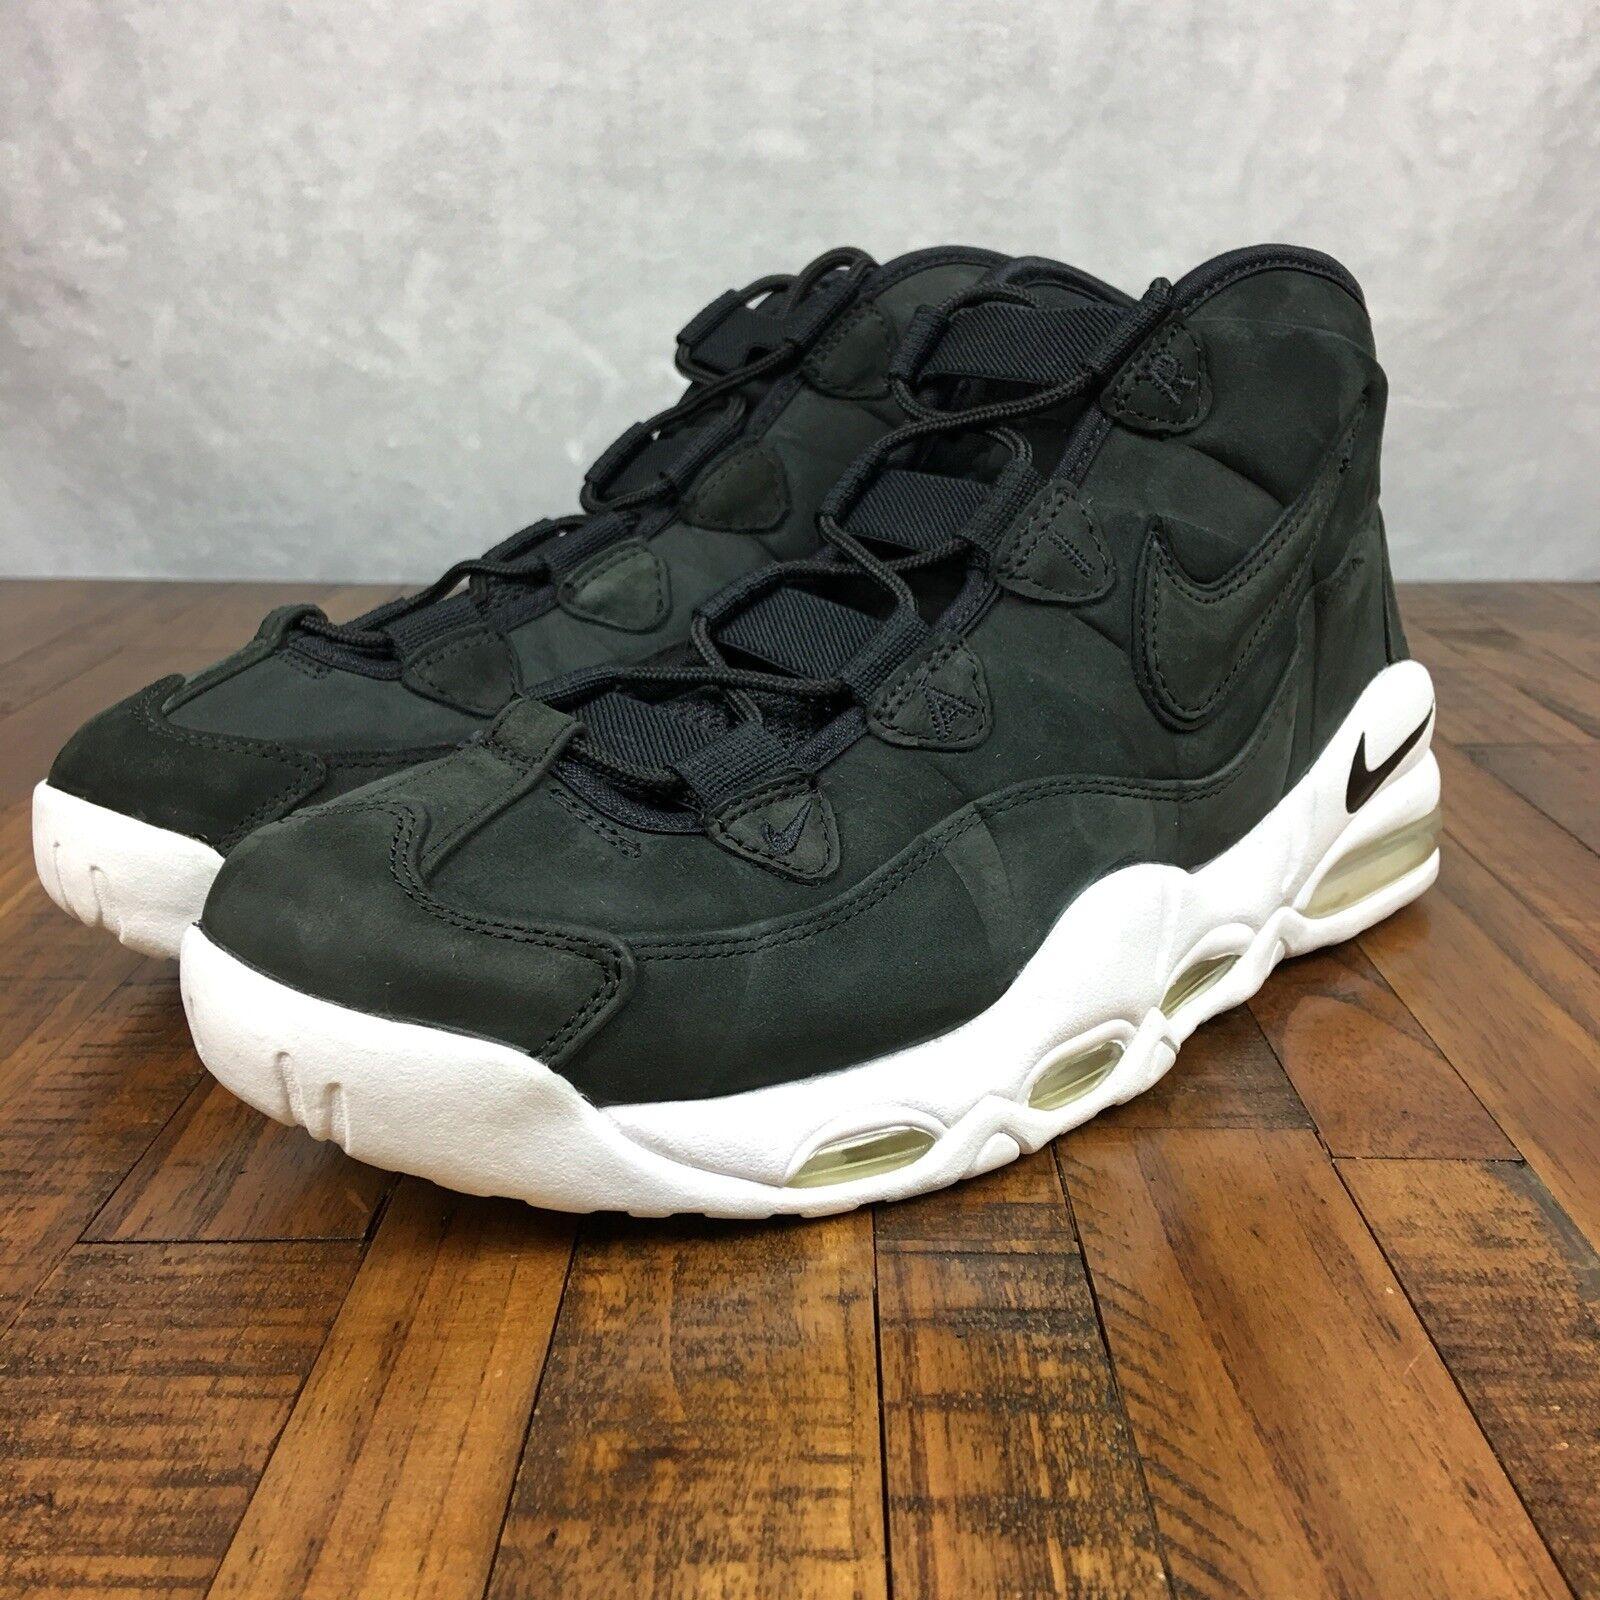 Nike Air Max Uptempo Hi Top Basketball Black Shelf Wear 311090 005 Men Size 10.5